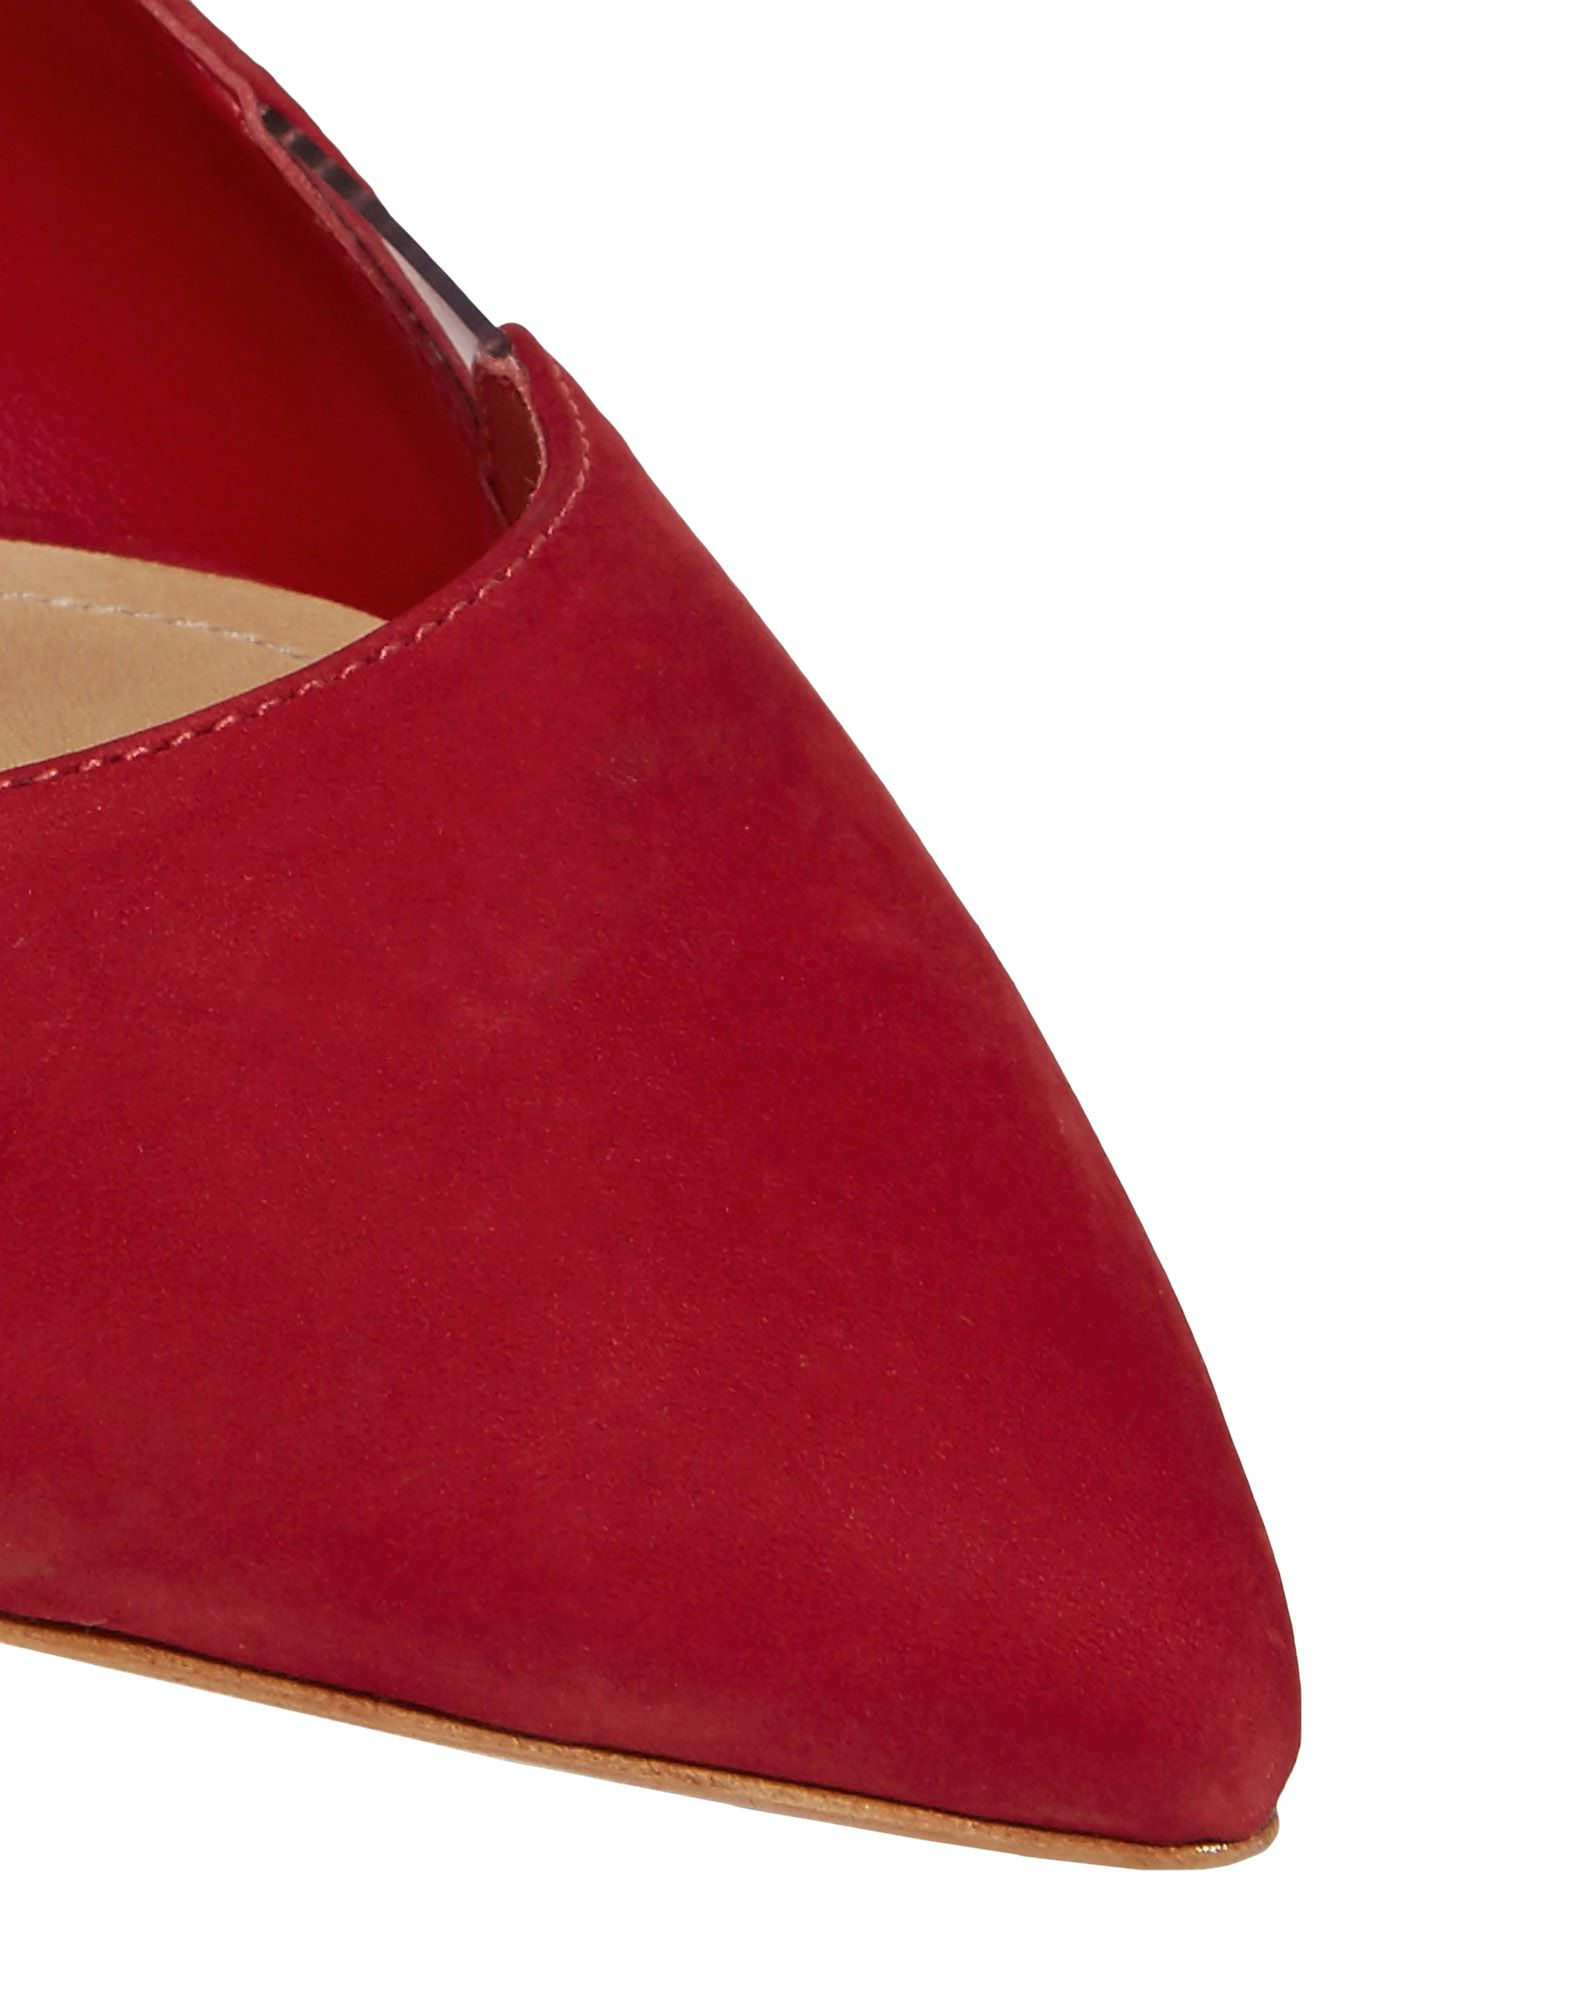 Schutz Schuhe Ballerinas Damen 11515700BF Gute Qualität beliebte Schuhe Schutz 92a8f3